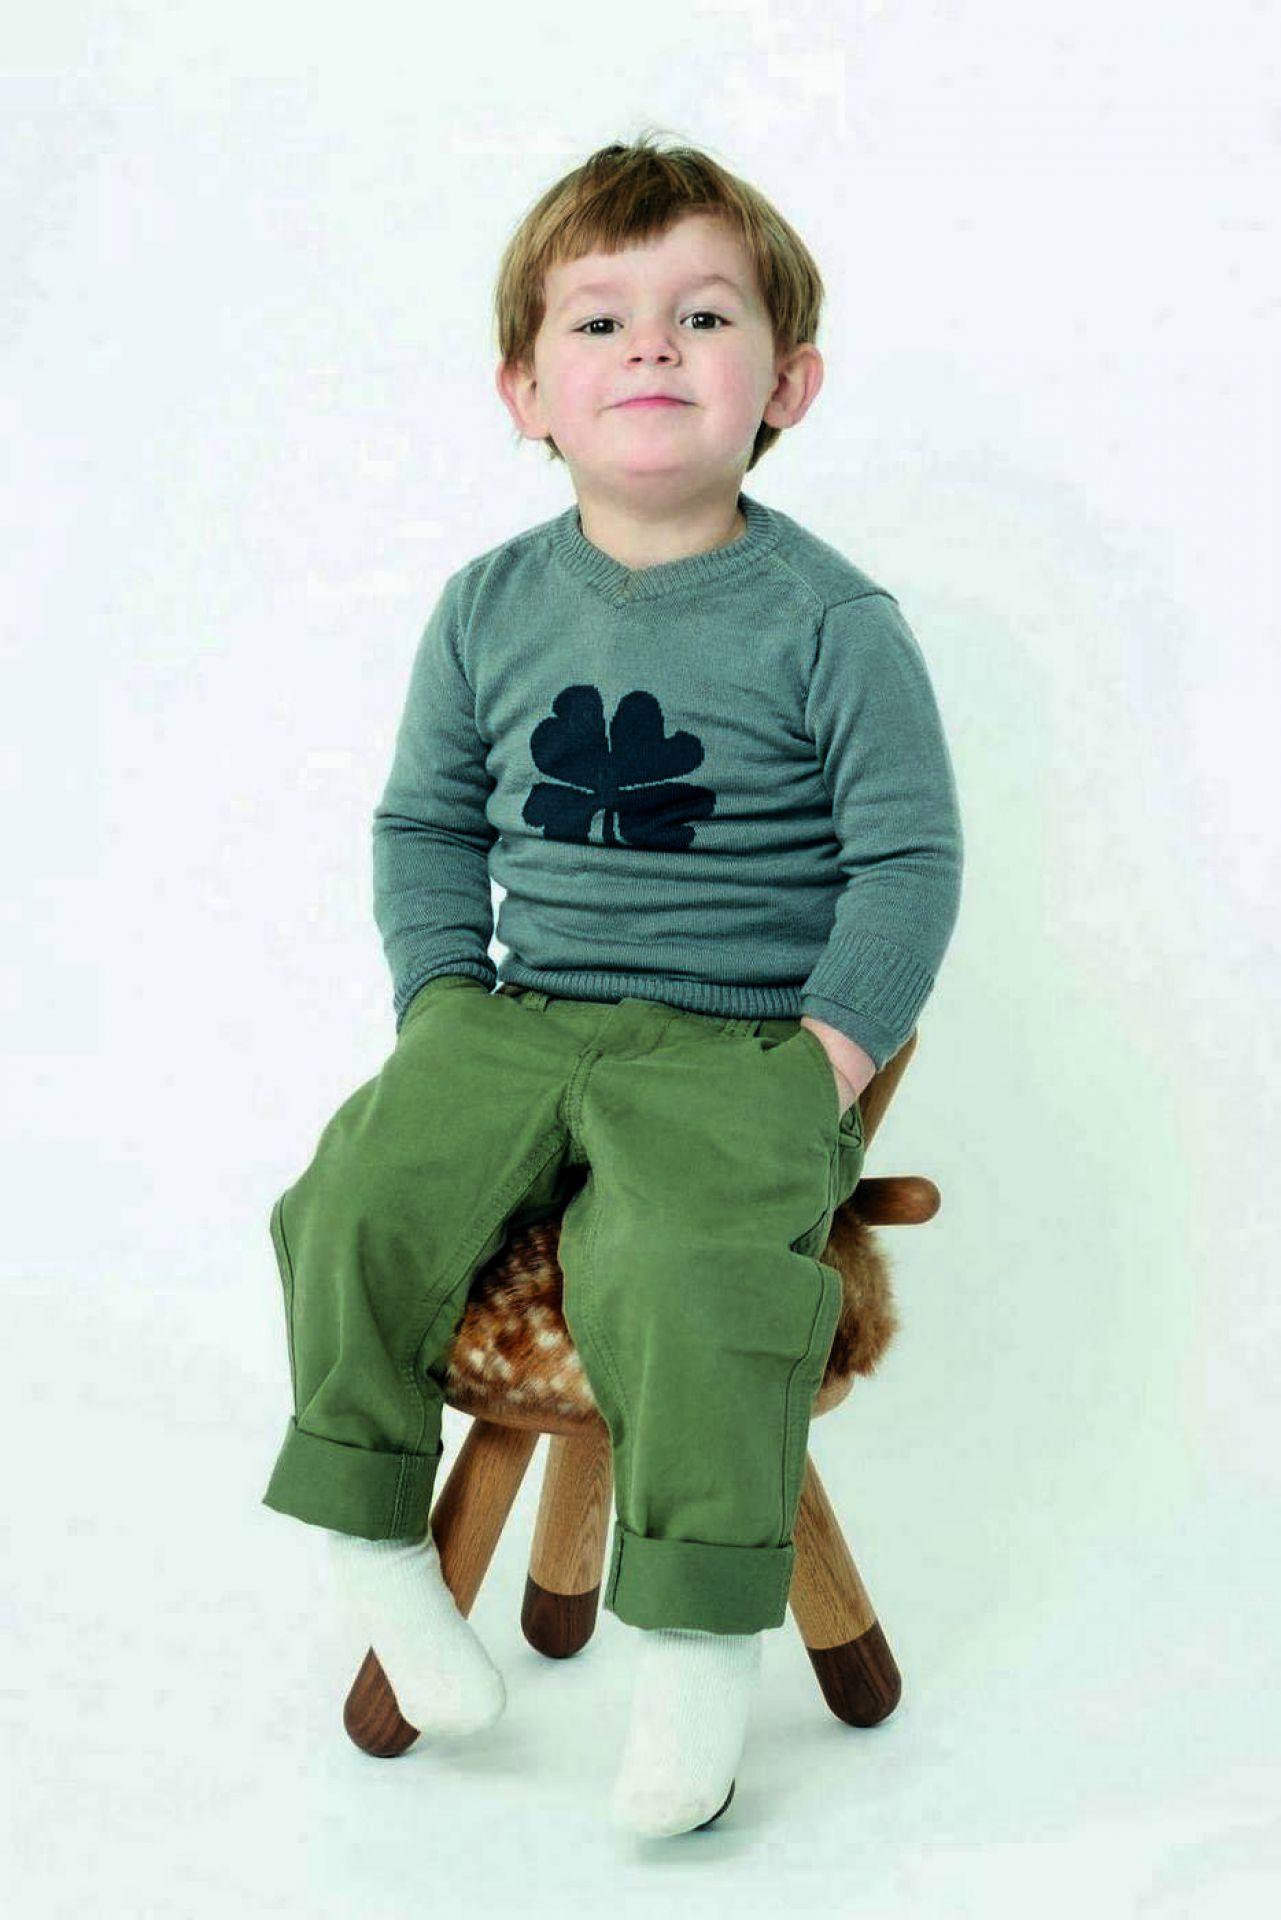 Bambi Chair children's chair EO